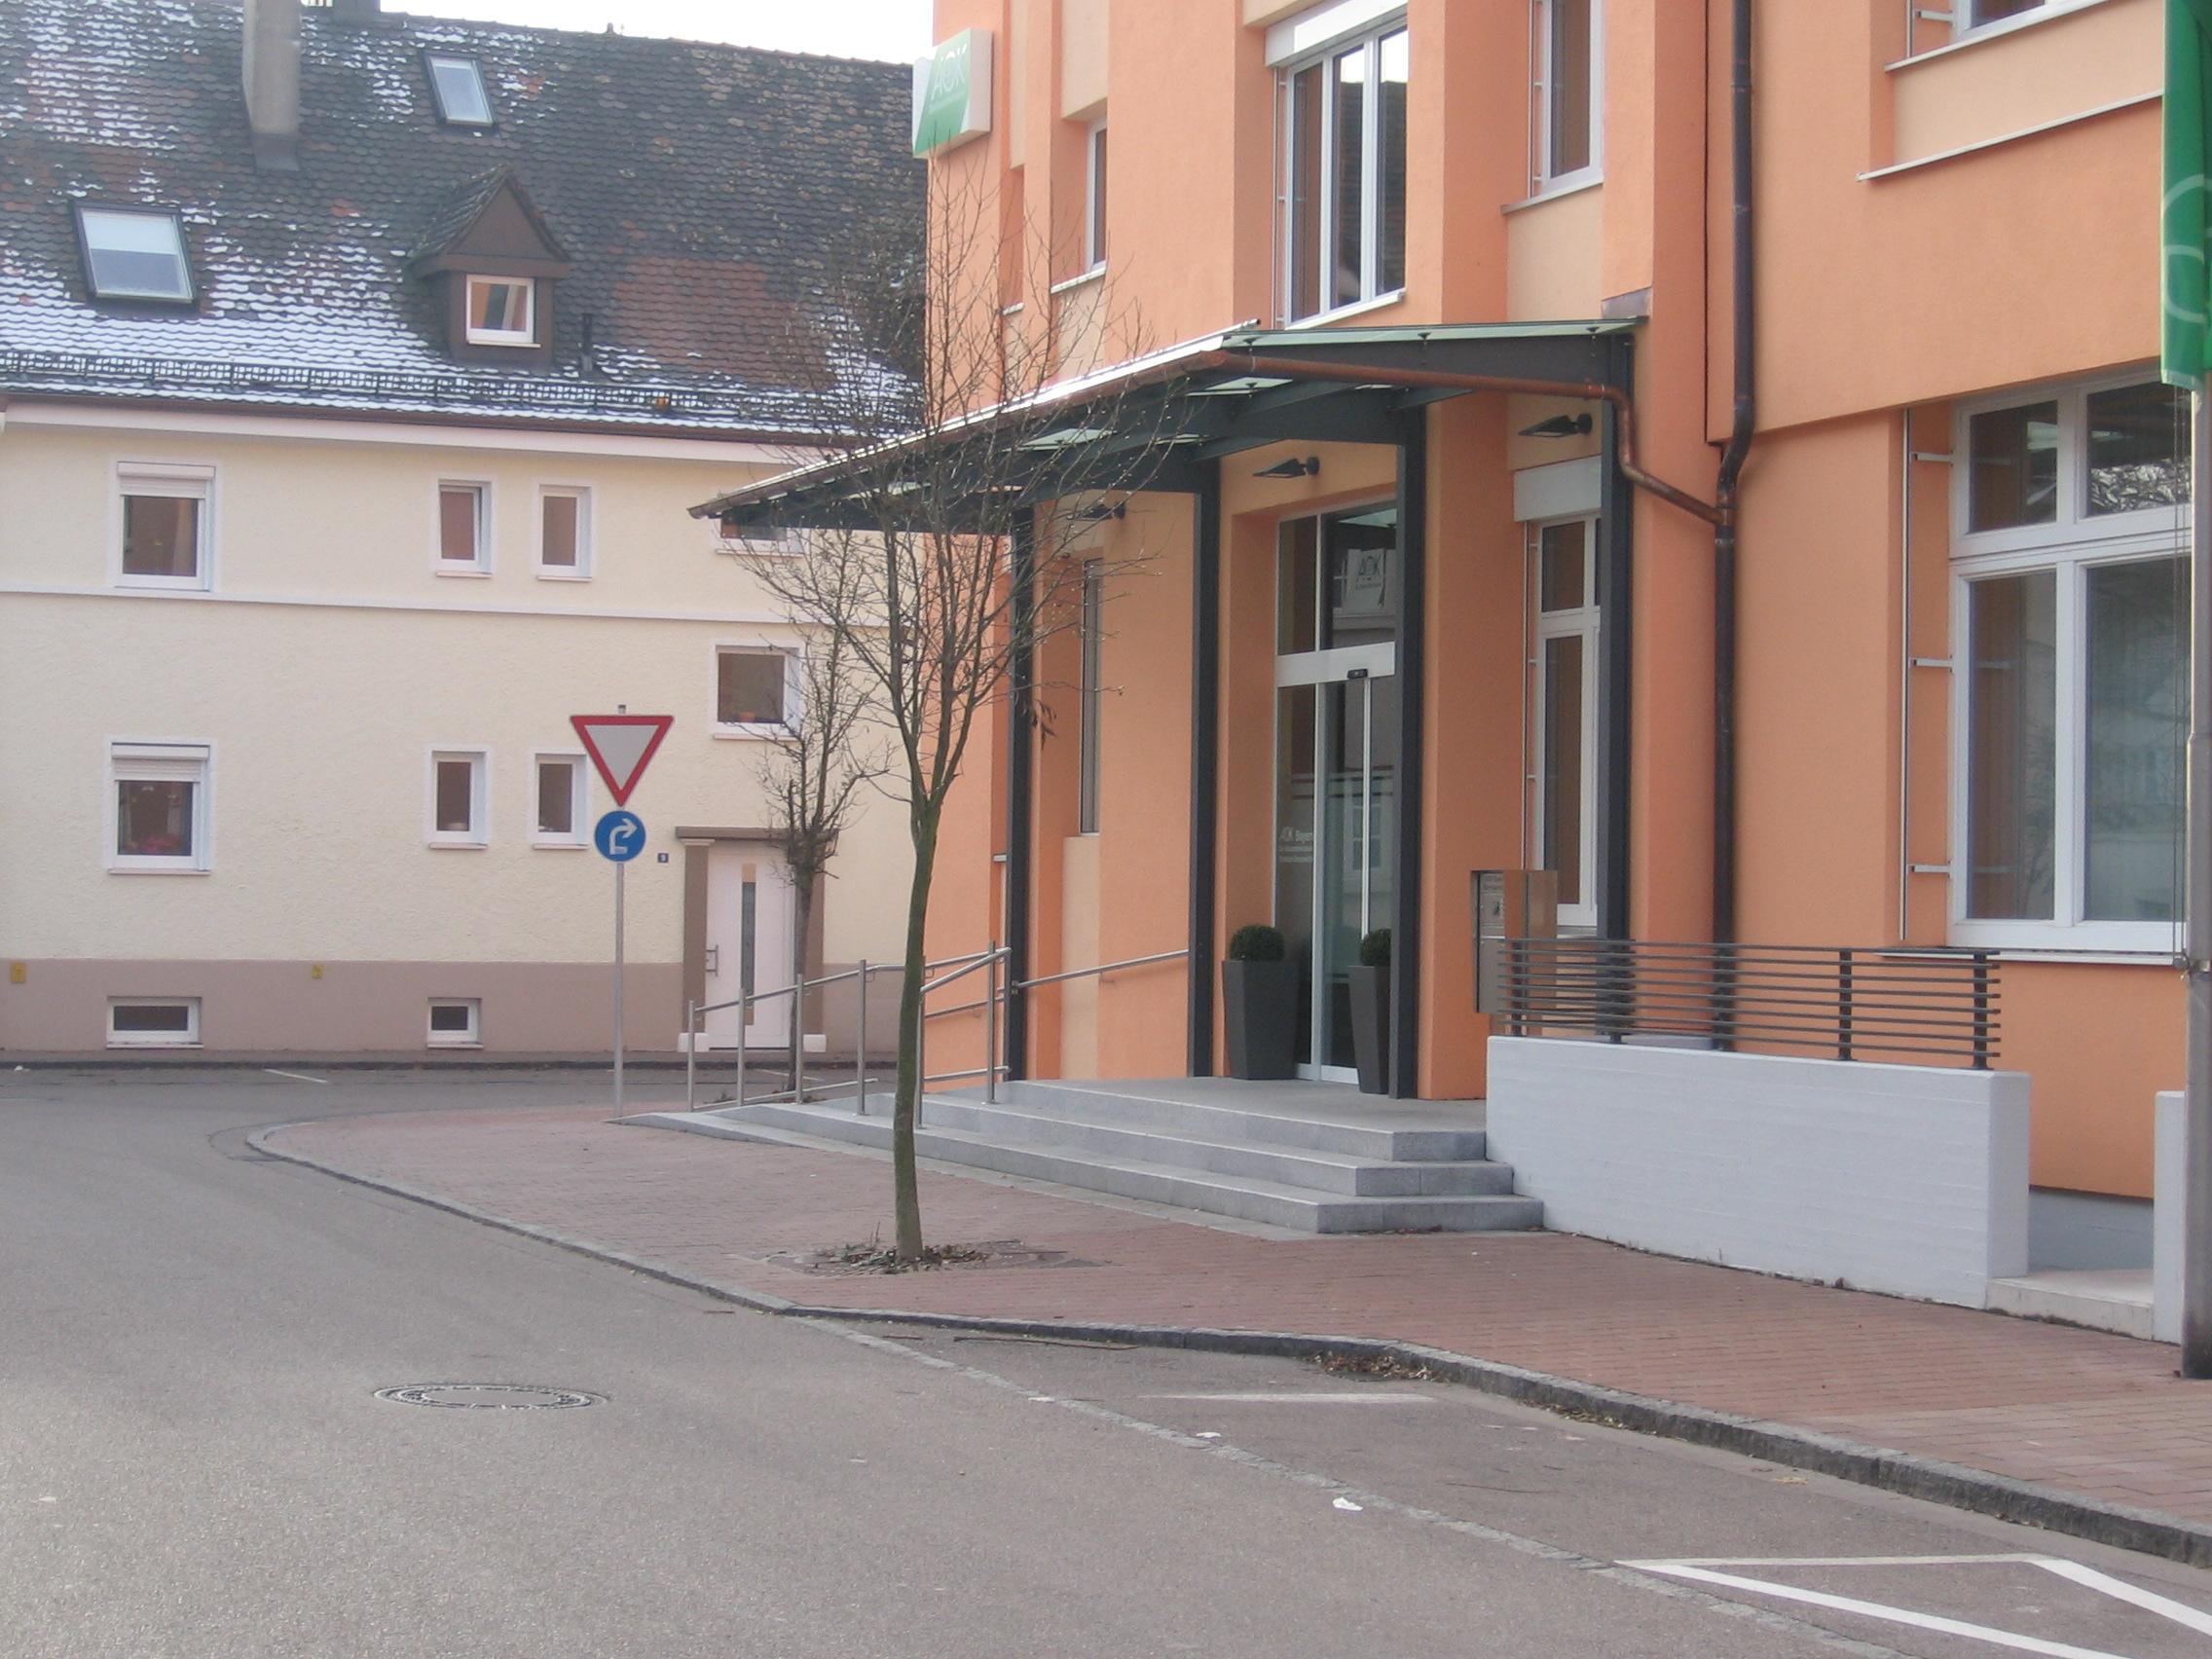 3-Fassadensanierung-AOK-Donauwörth-Eingang-ÜberdachungIMG_0656